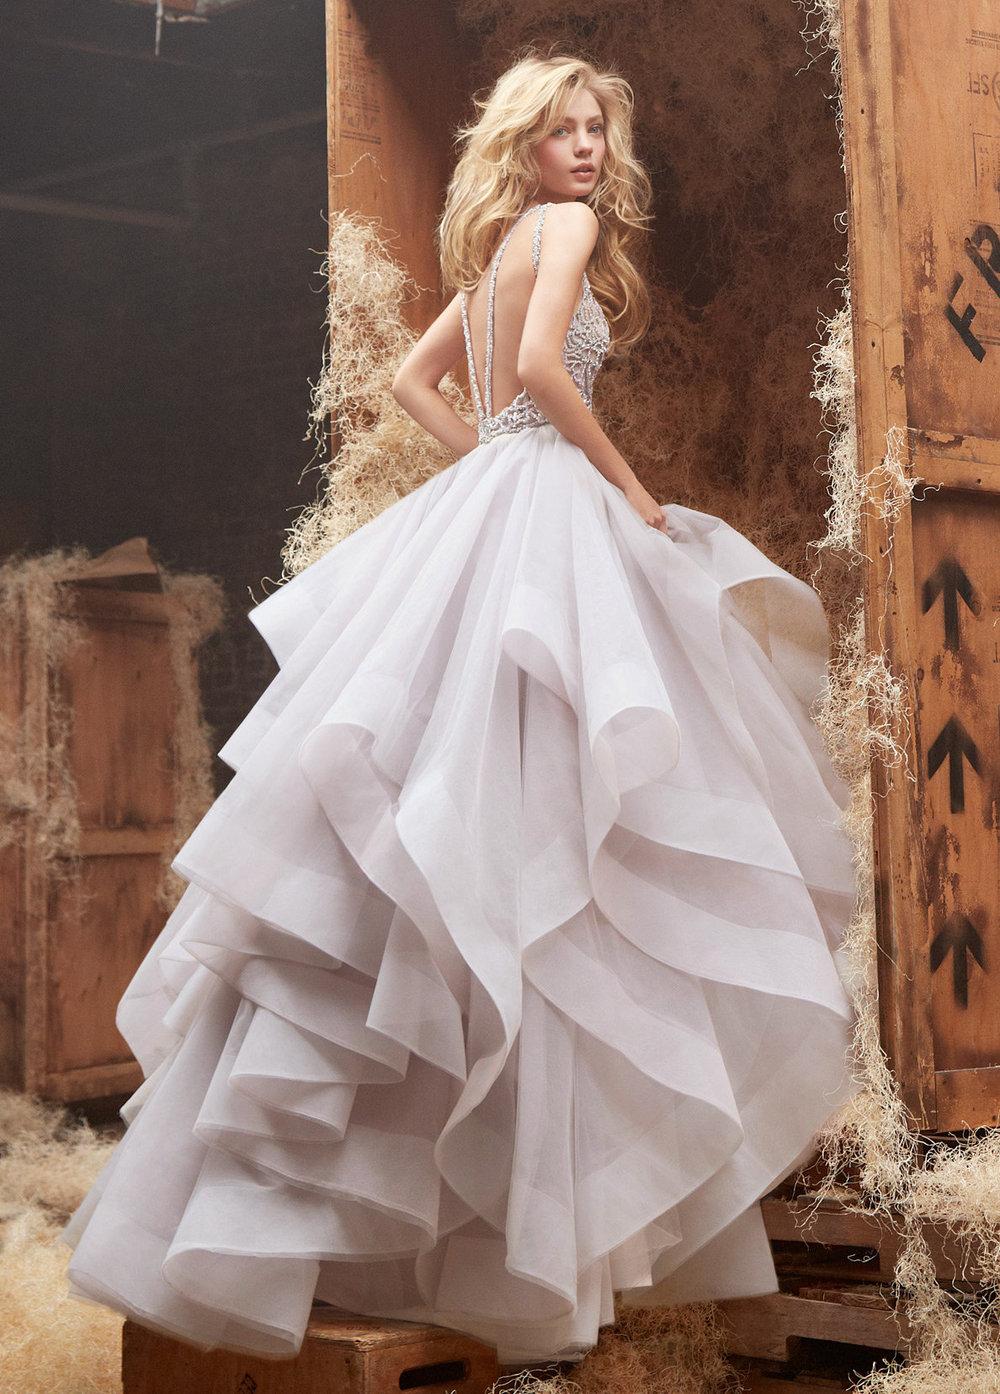 hayley-paige-bridal-tulle-halter-high-neck-alabaster-crystal-horse-hair-flounced-chapel-train-6413_lg.jpg